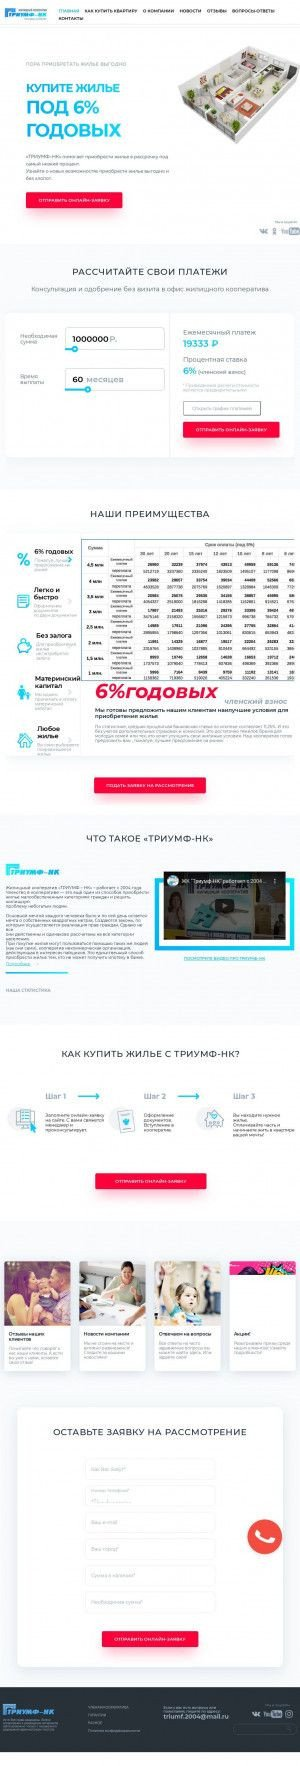 Предпросмотр для triumf-nk.ru — Триумф-НК